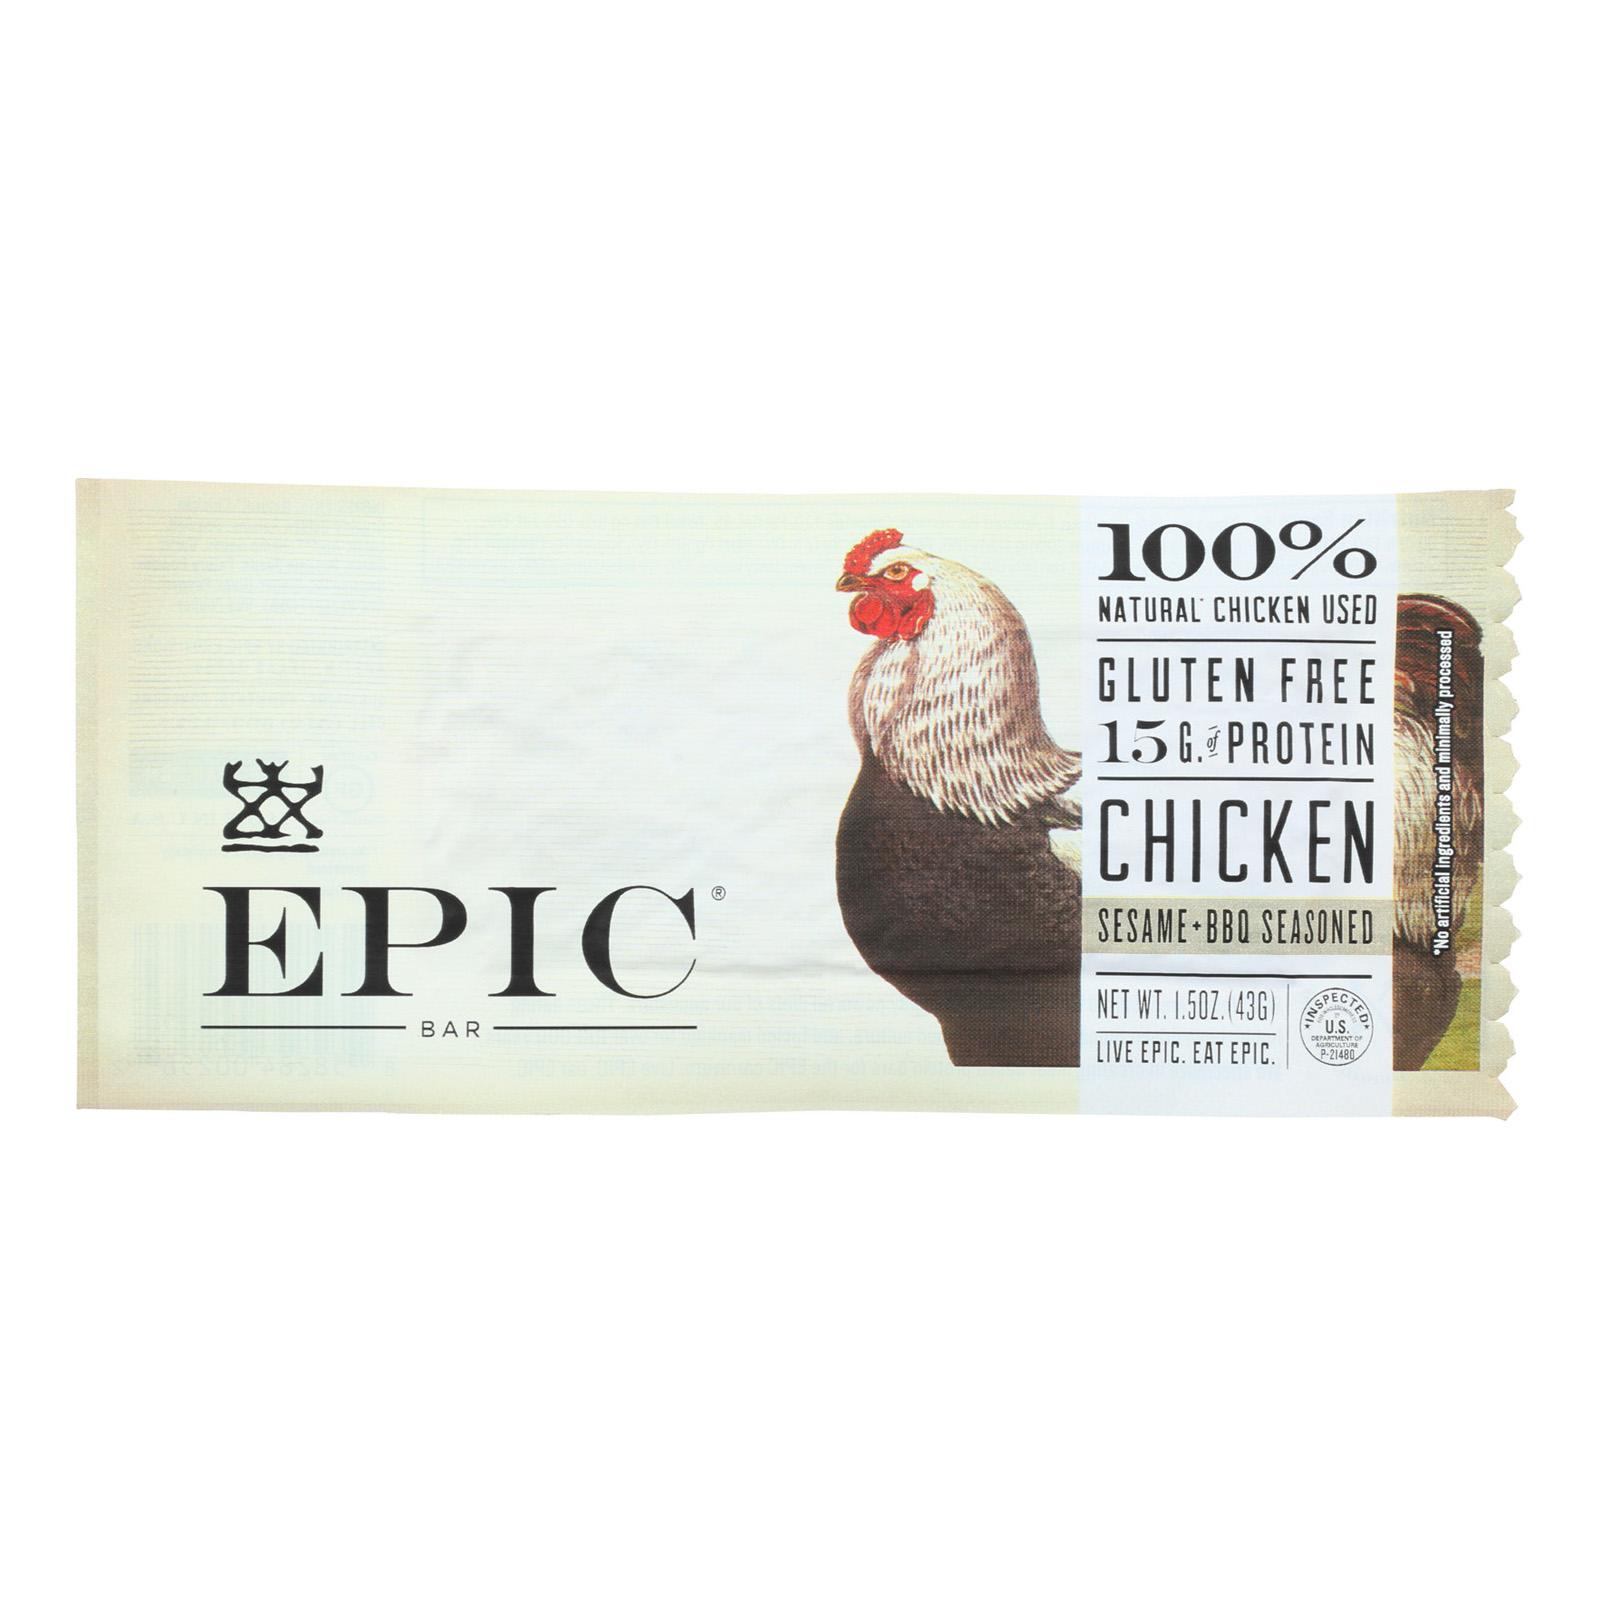 Epic Bar - Chicken Sesame Bbq - 1.5 Oz Bars - Case Of 12